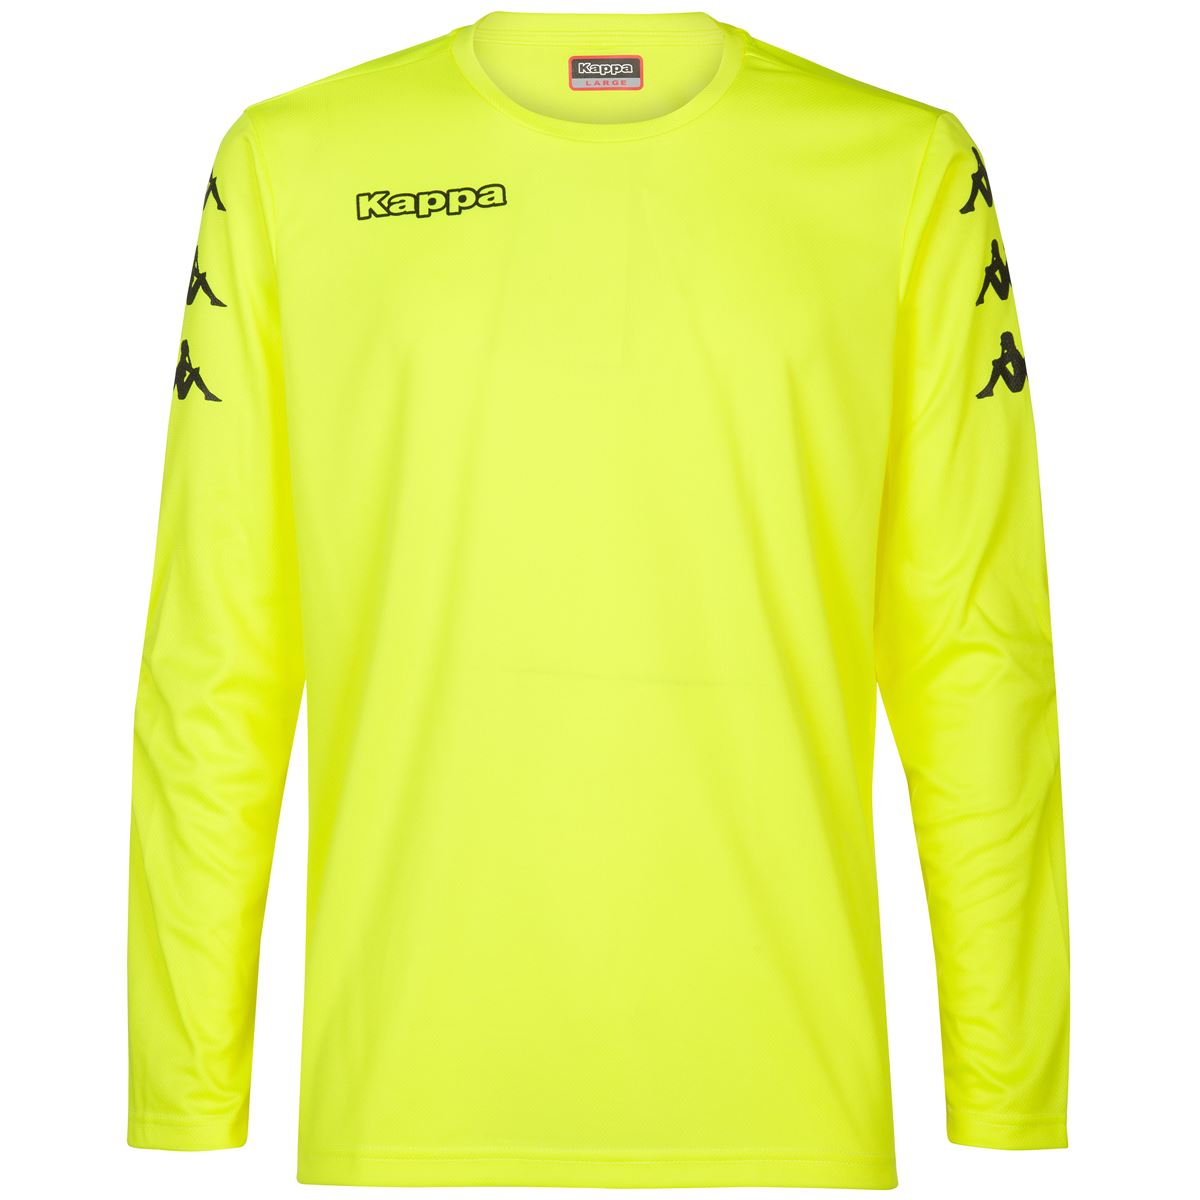 Kappa Active Jerseys for man-304IEH0